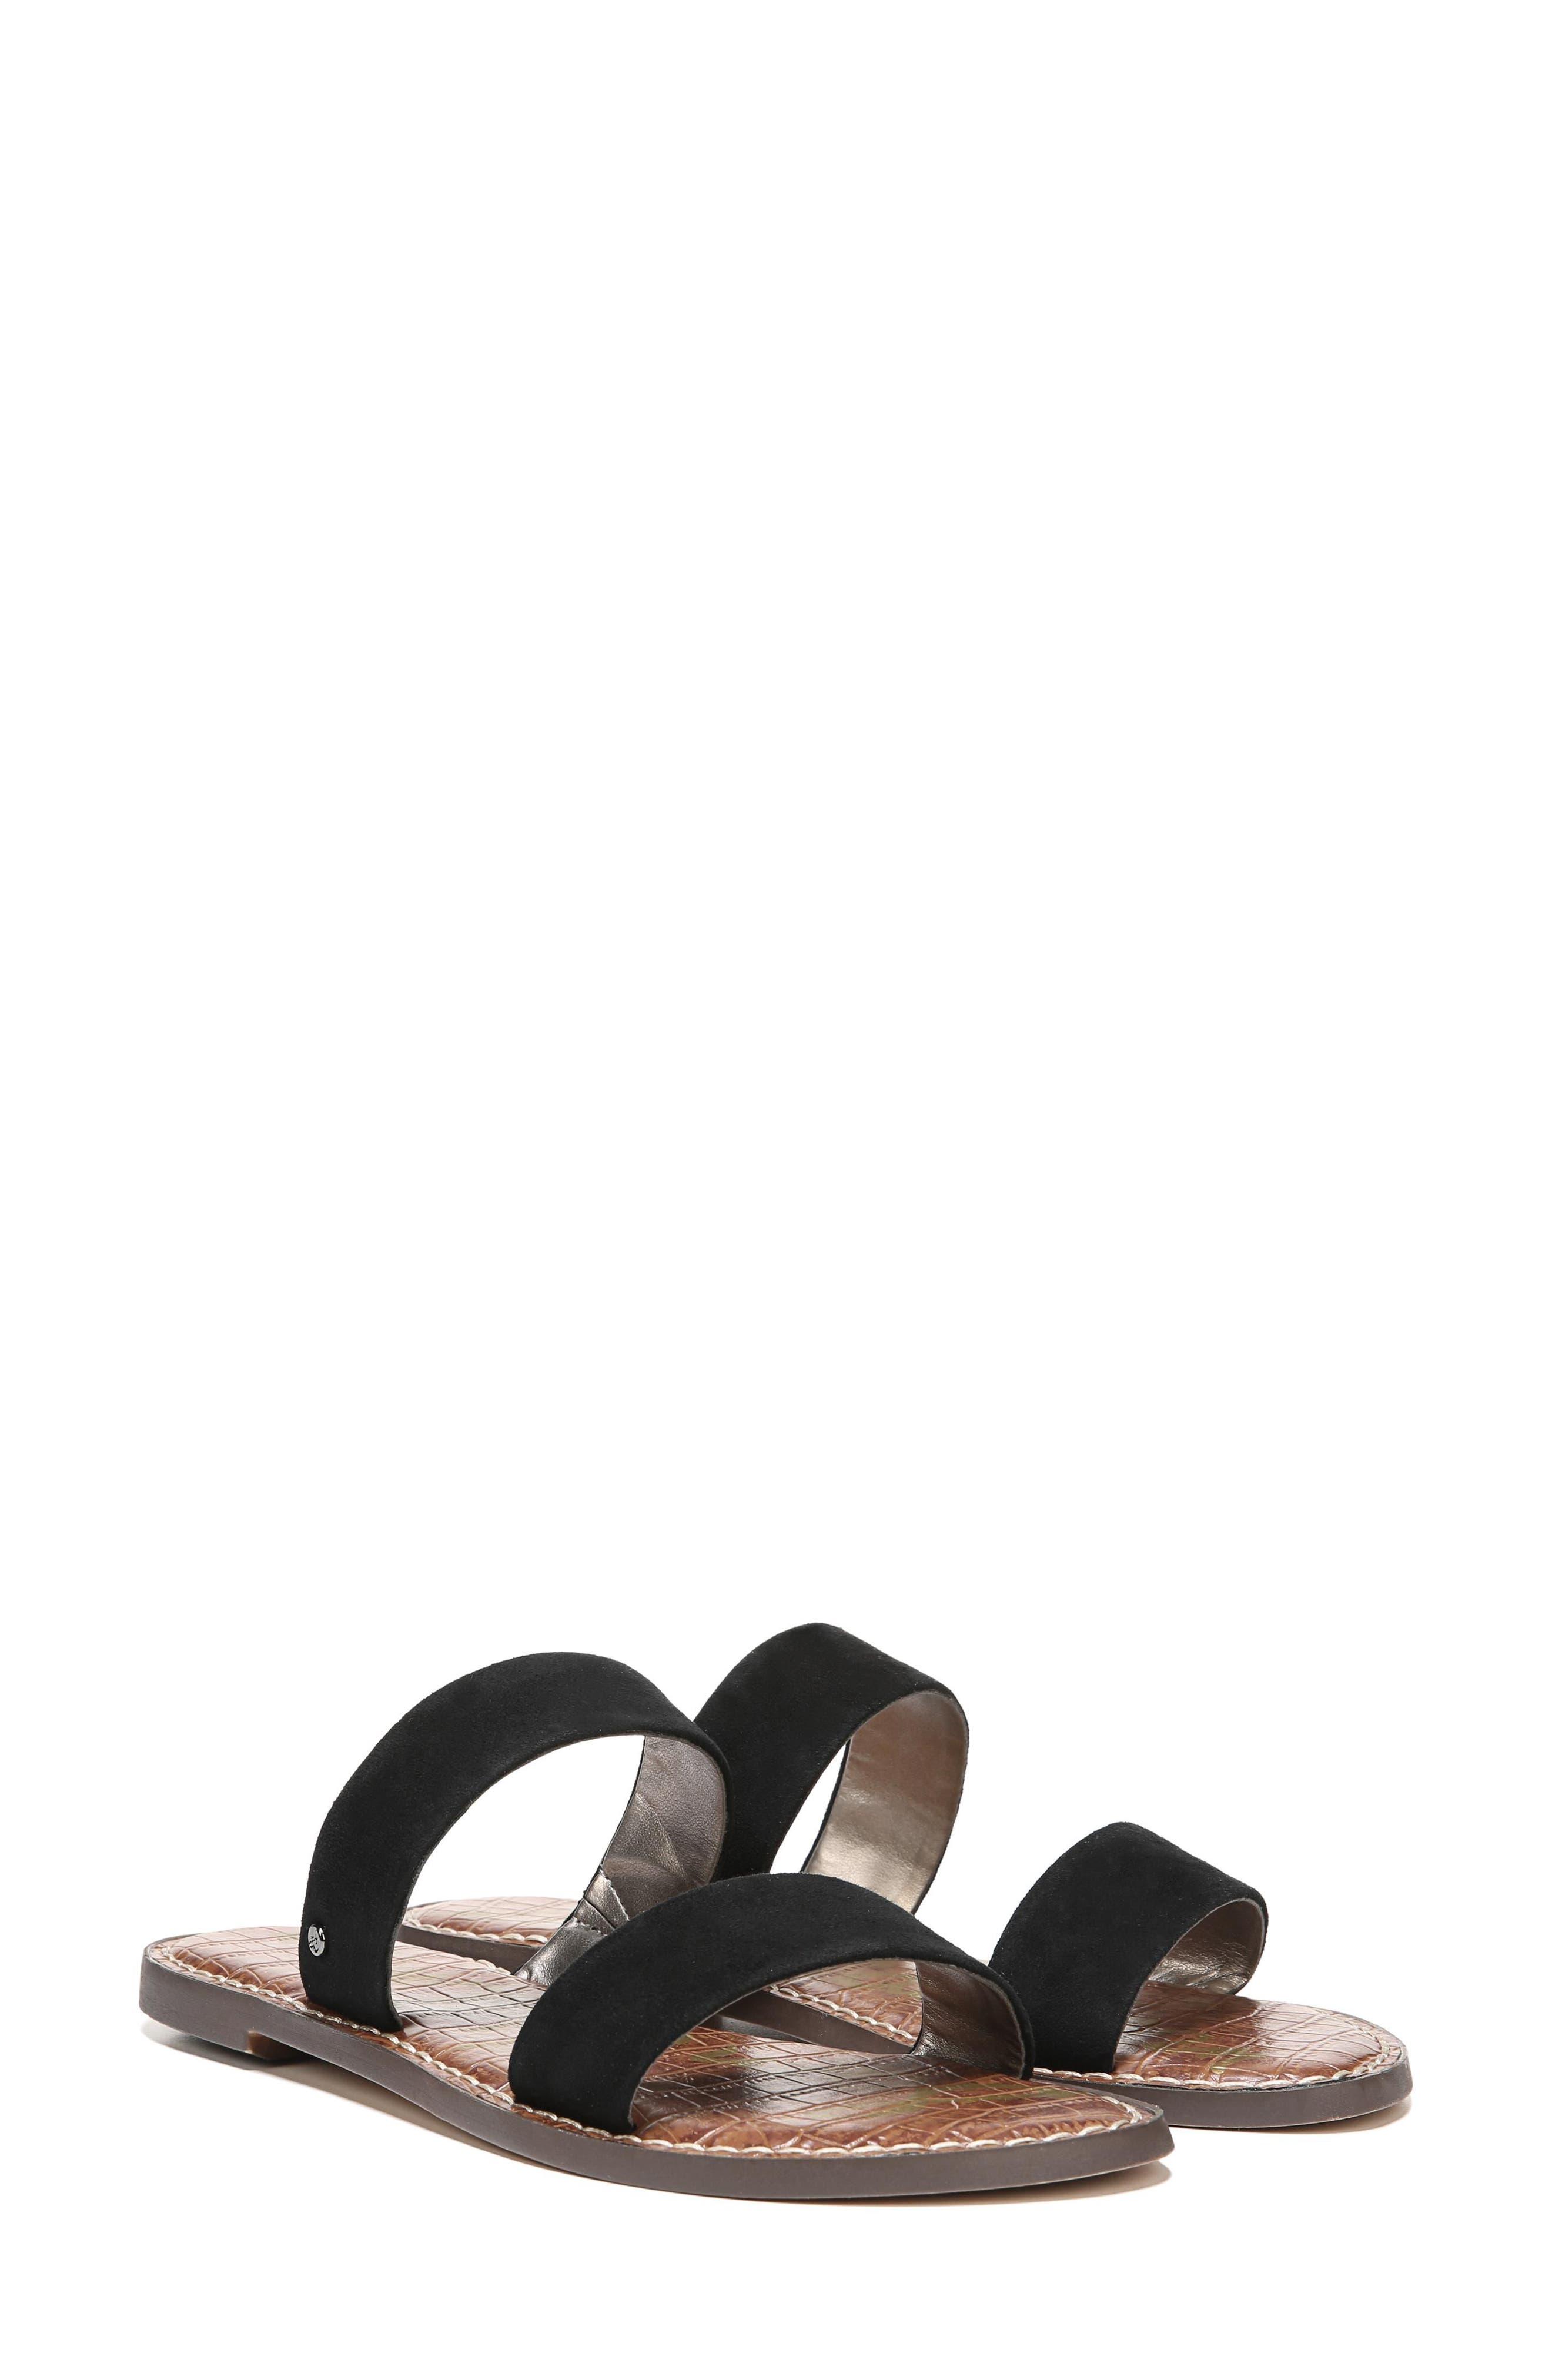 Gala Two Strap Slide Sandal,                             Alternate thumbnail 8, color,                             BLACK SUEDE